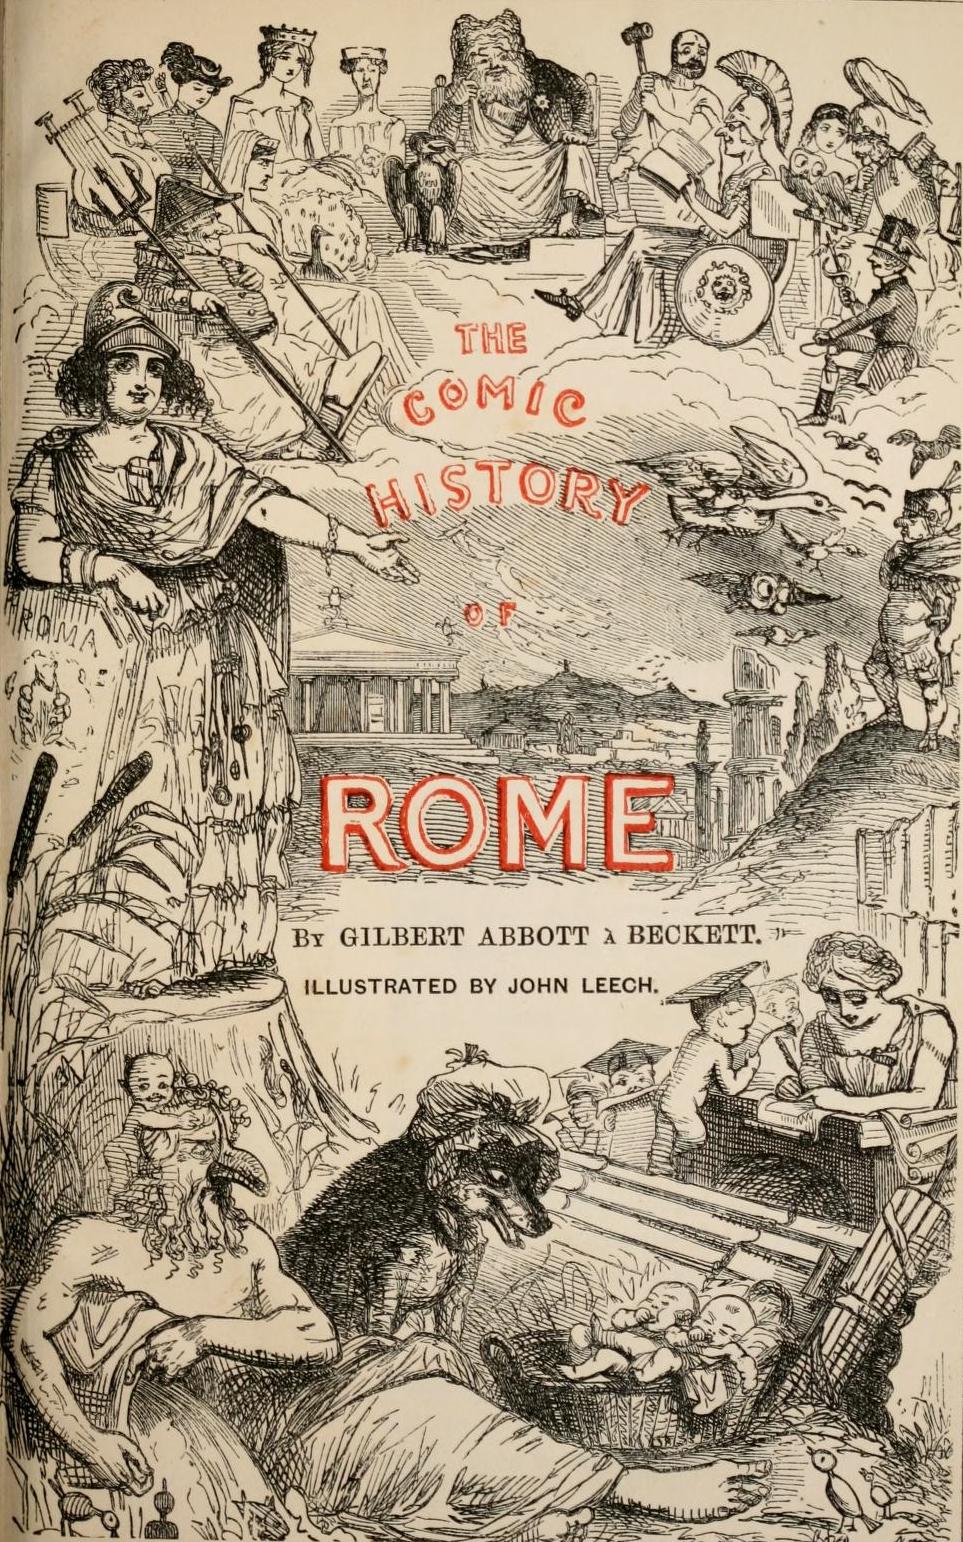 The Eternal Guffaw John Leech And The Comic History Of Rome